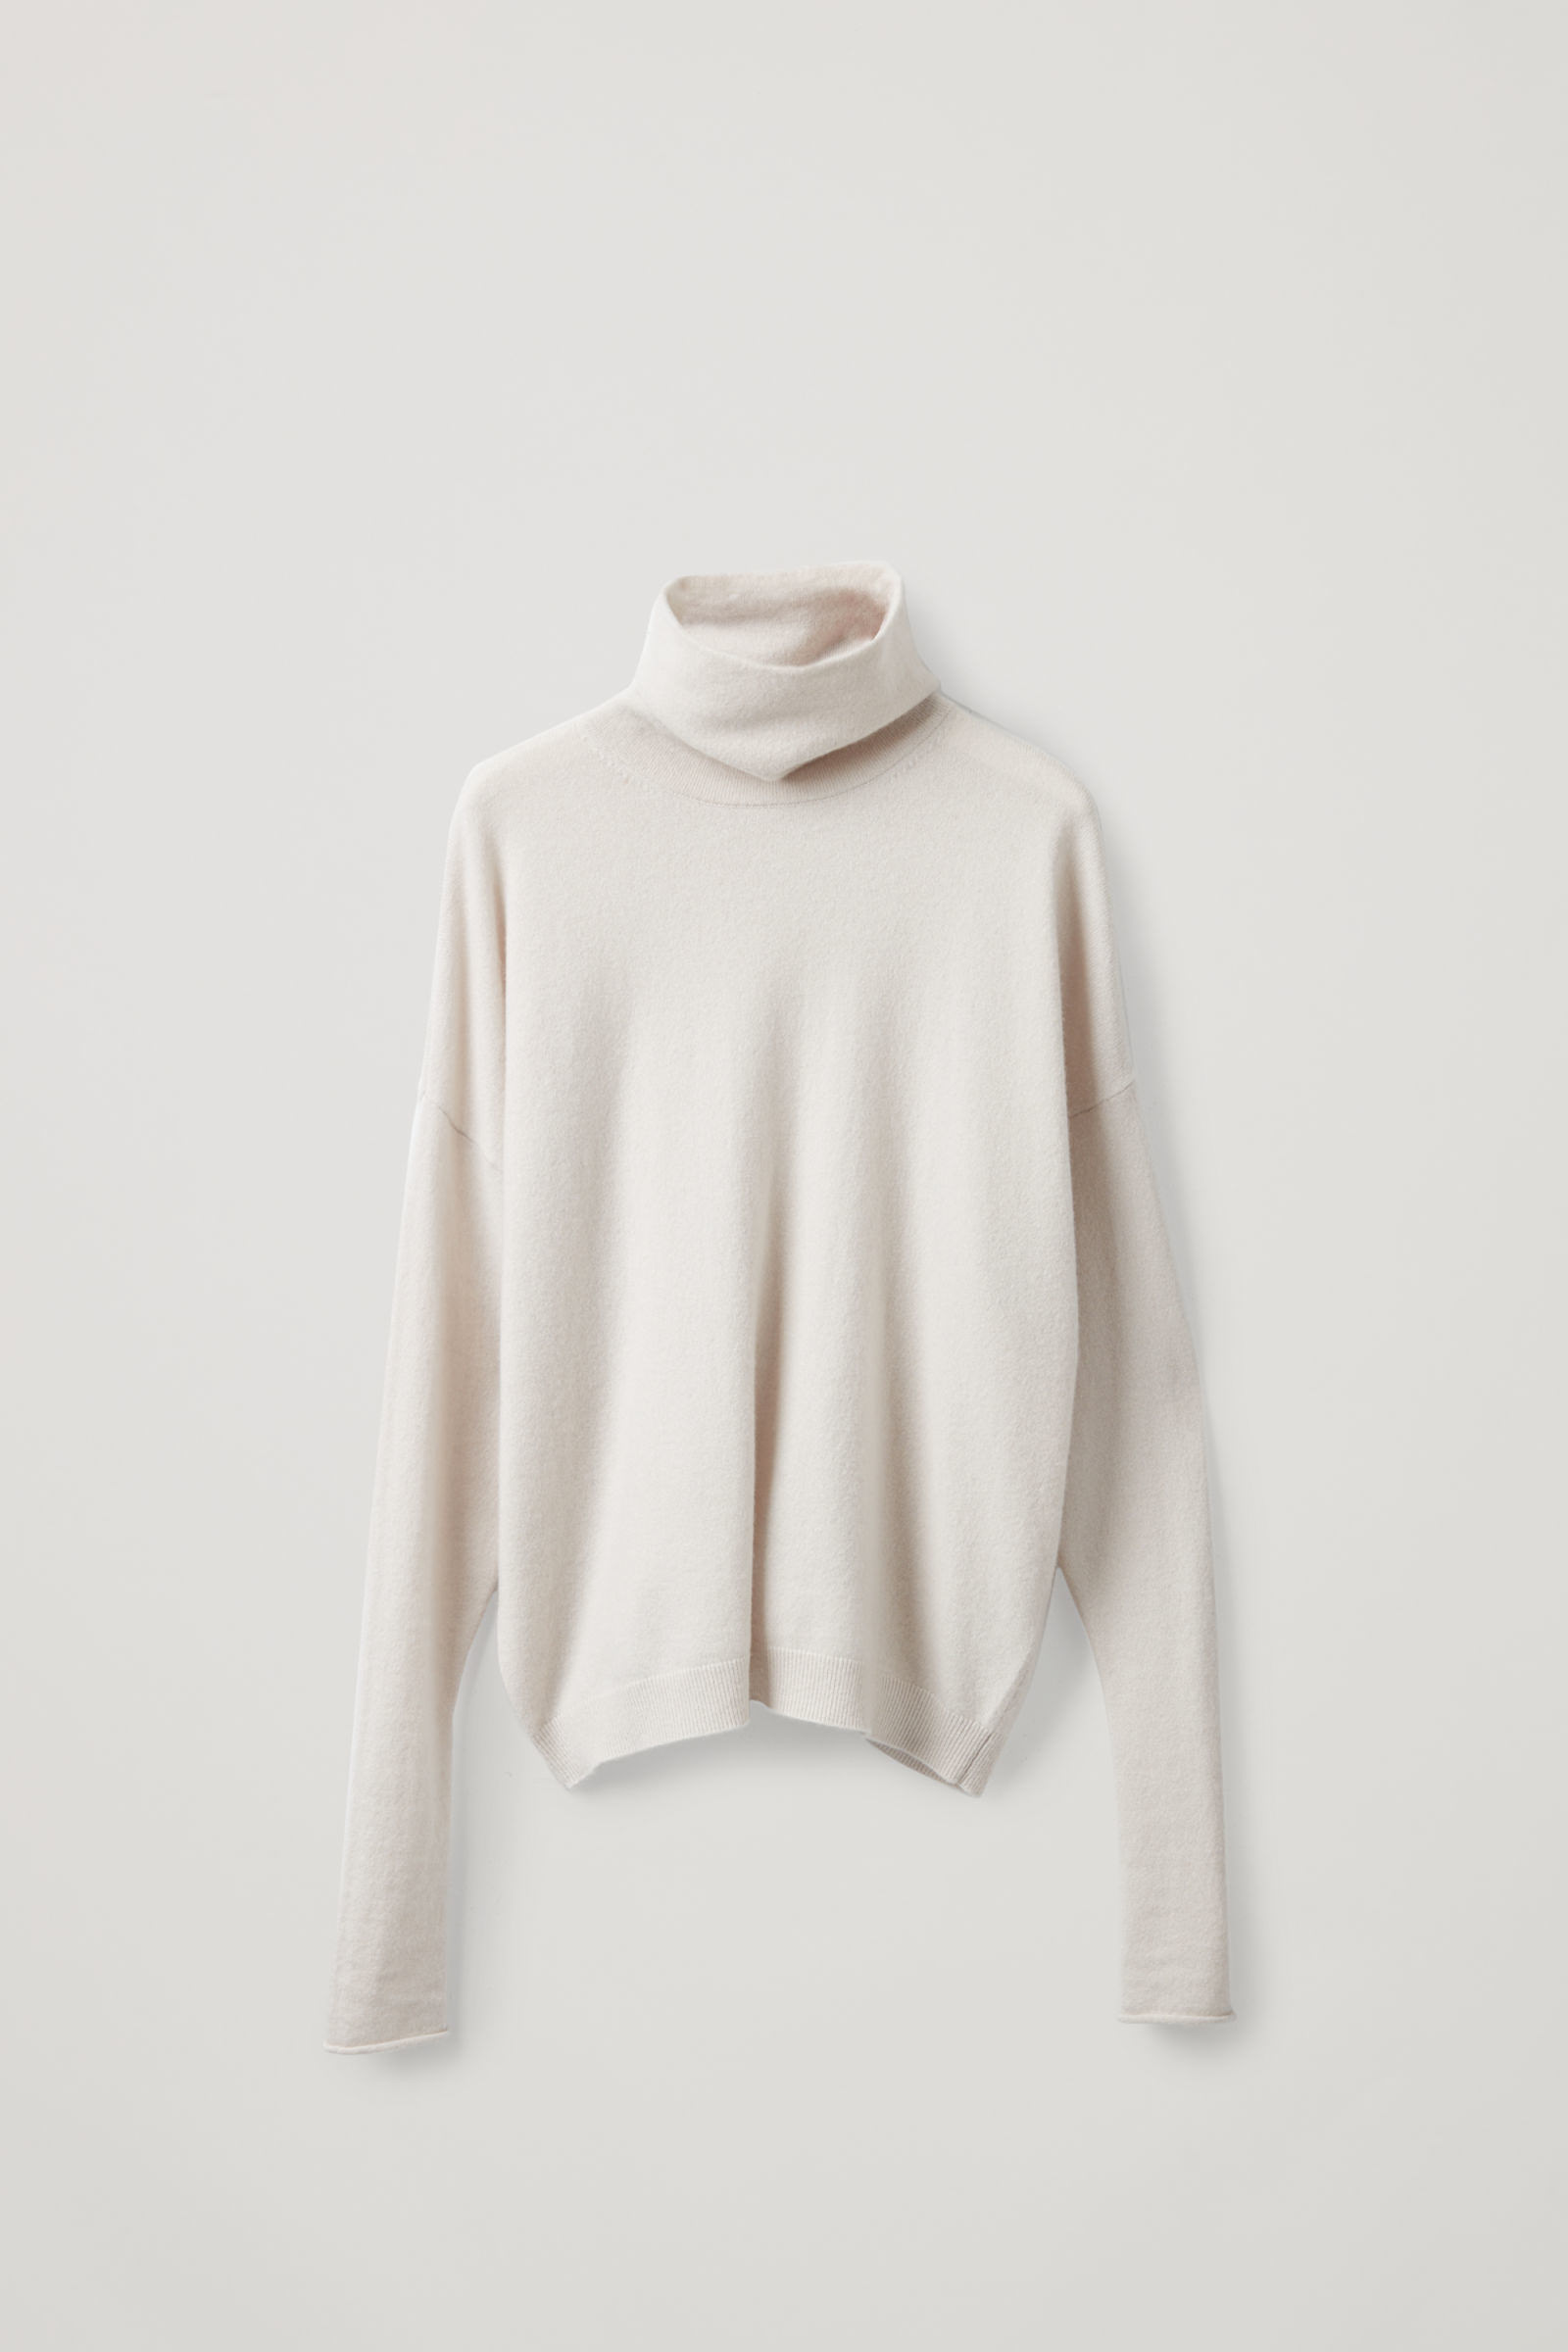 COS 롤넥 캐시미어 스웨터의 라이트 베이지컬러 Product입니다.